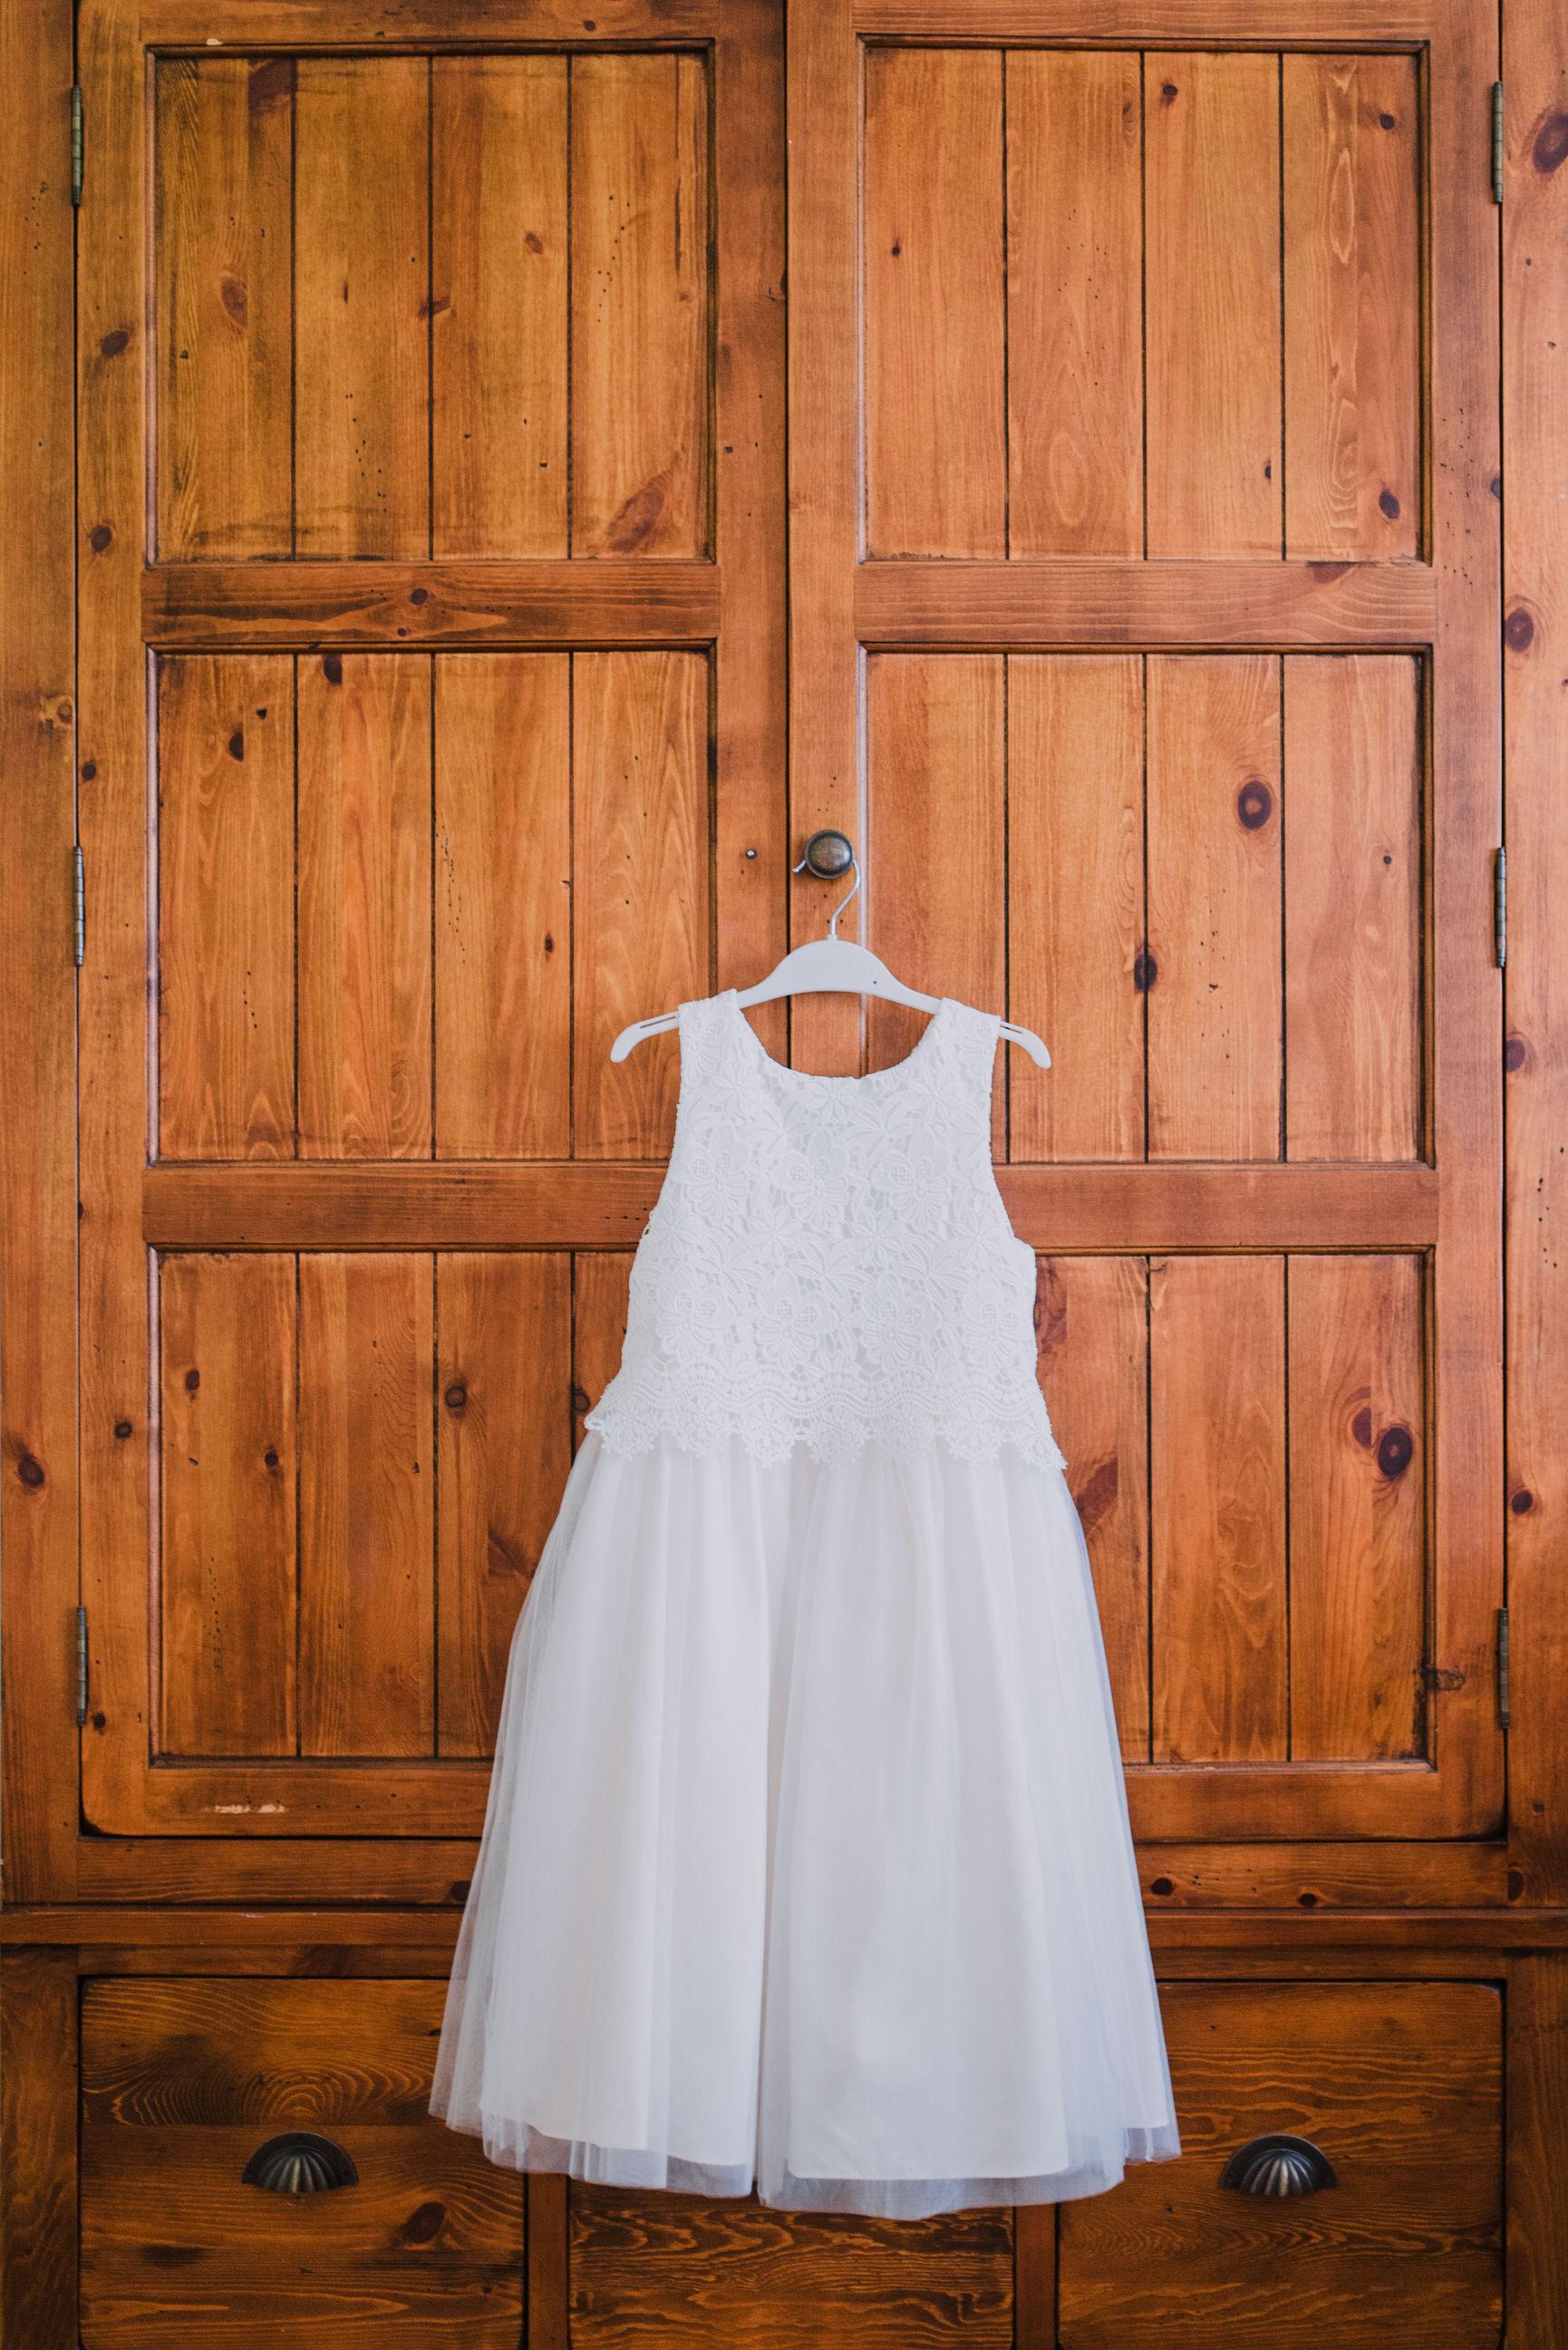 lissanoure castle wedding, northern ireland wedding photographer, romantic northern irish wedding venue, castle wedding ireland, natural wedding photography ni (4).jpg